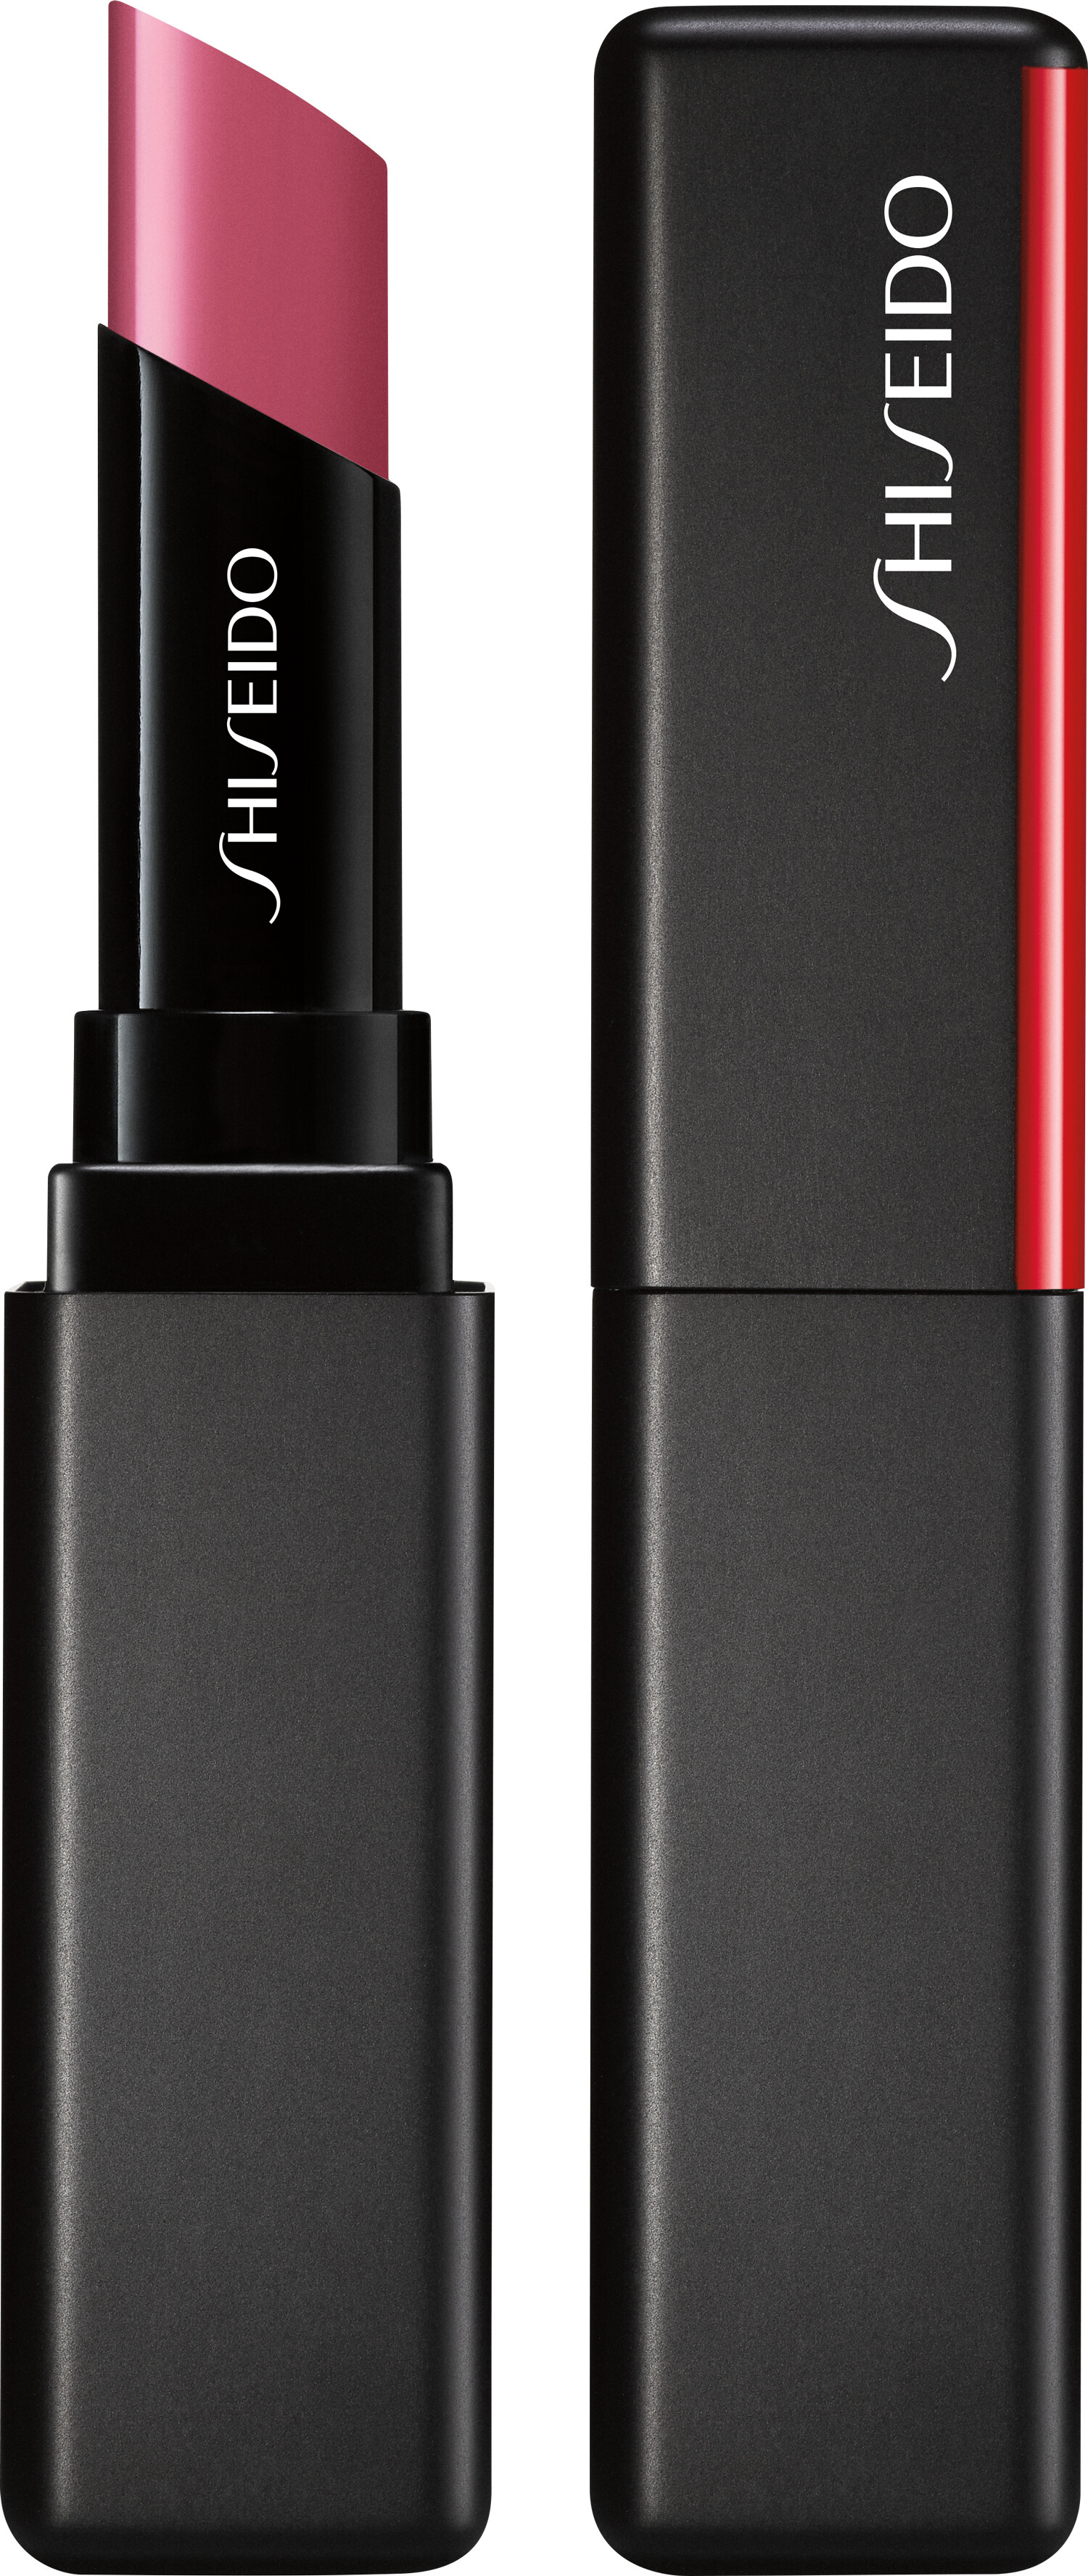 Shiseido VisionAiry Gel Lipstick 1.6g 207 - Pink Dynasty